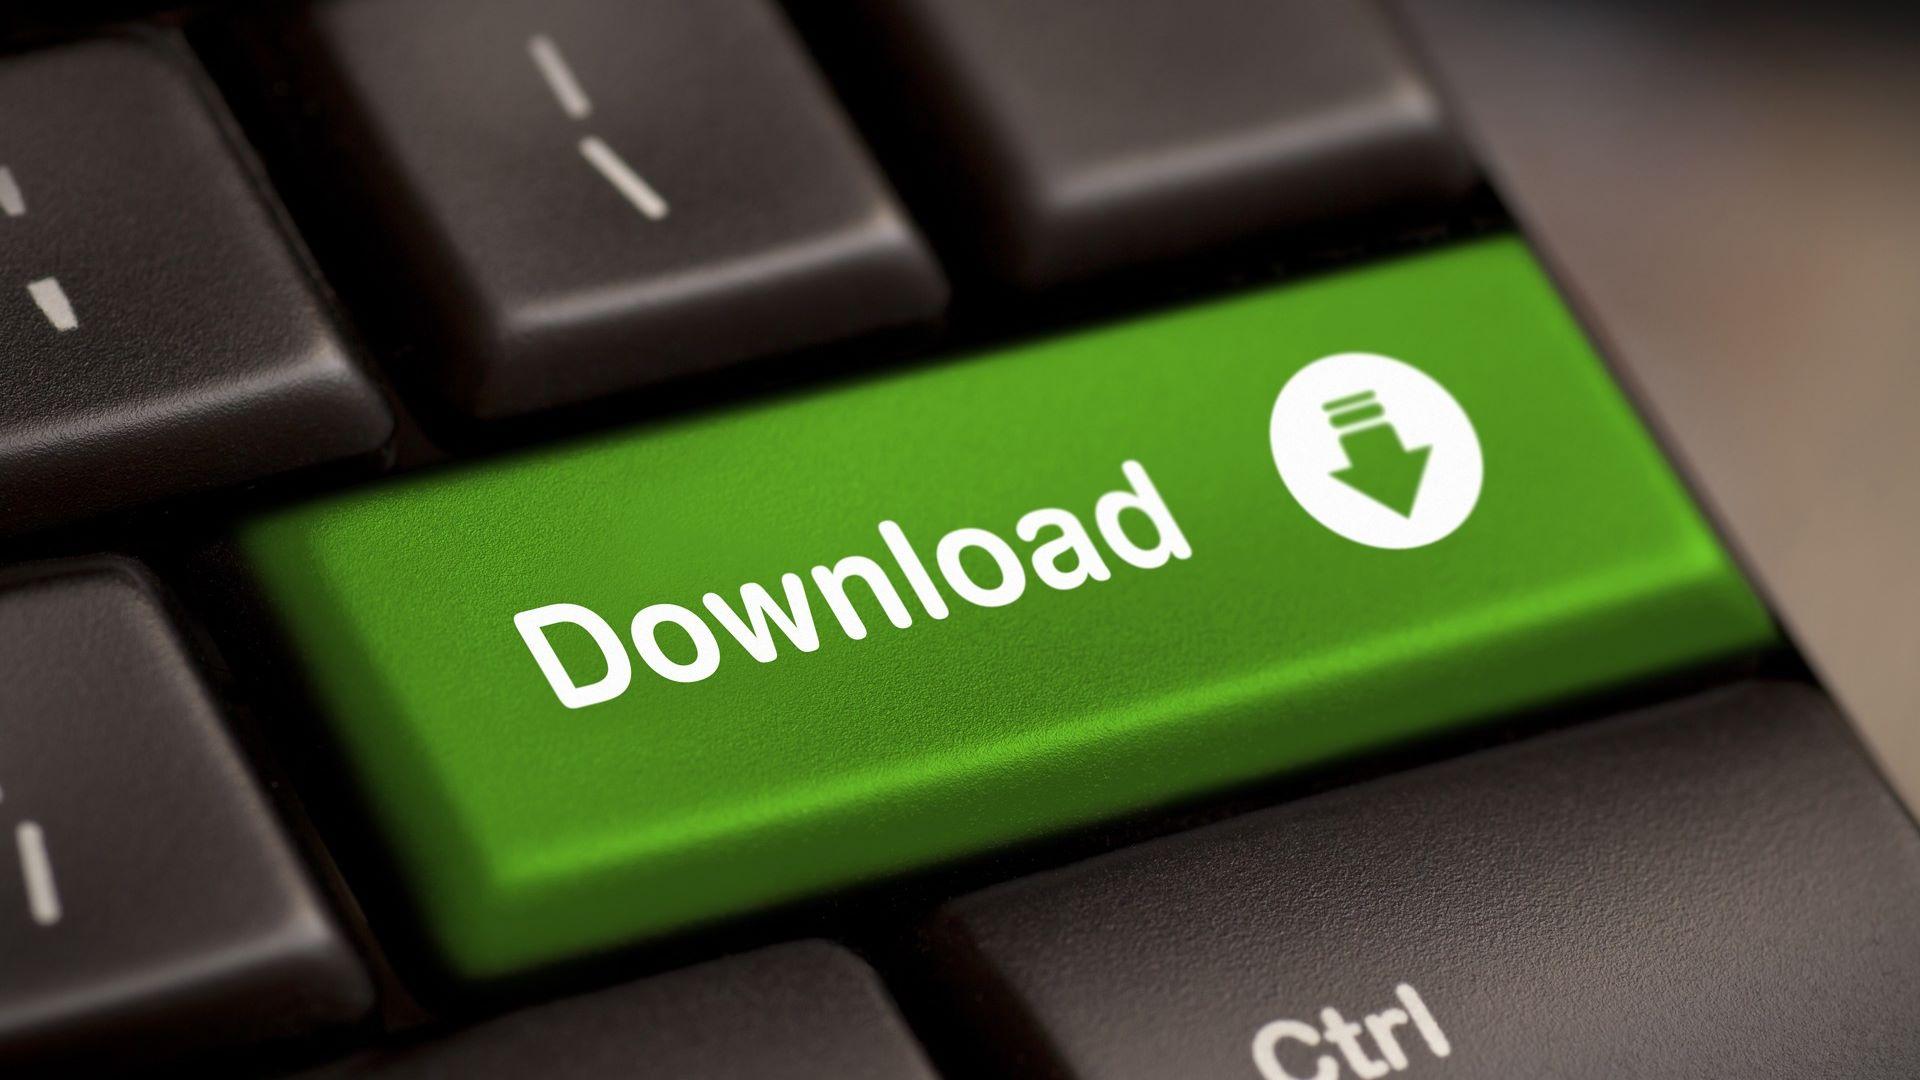 download-software-0